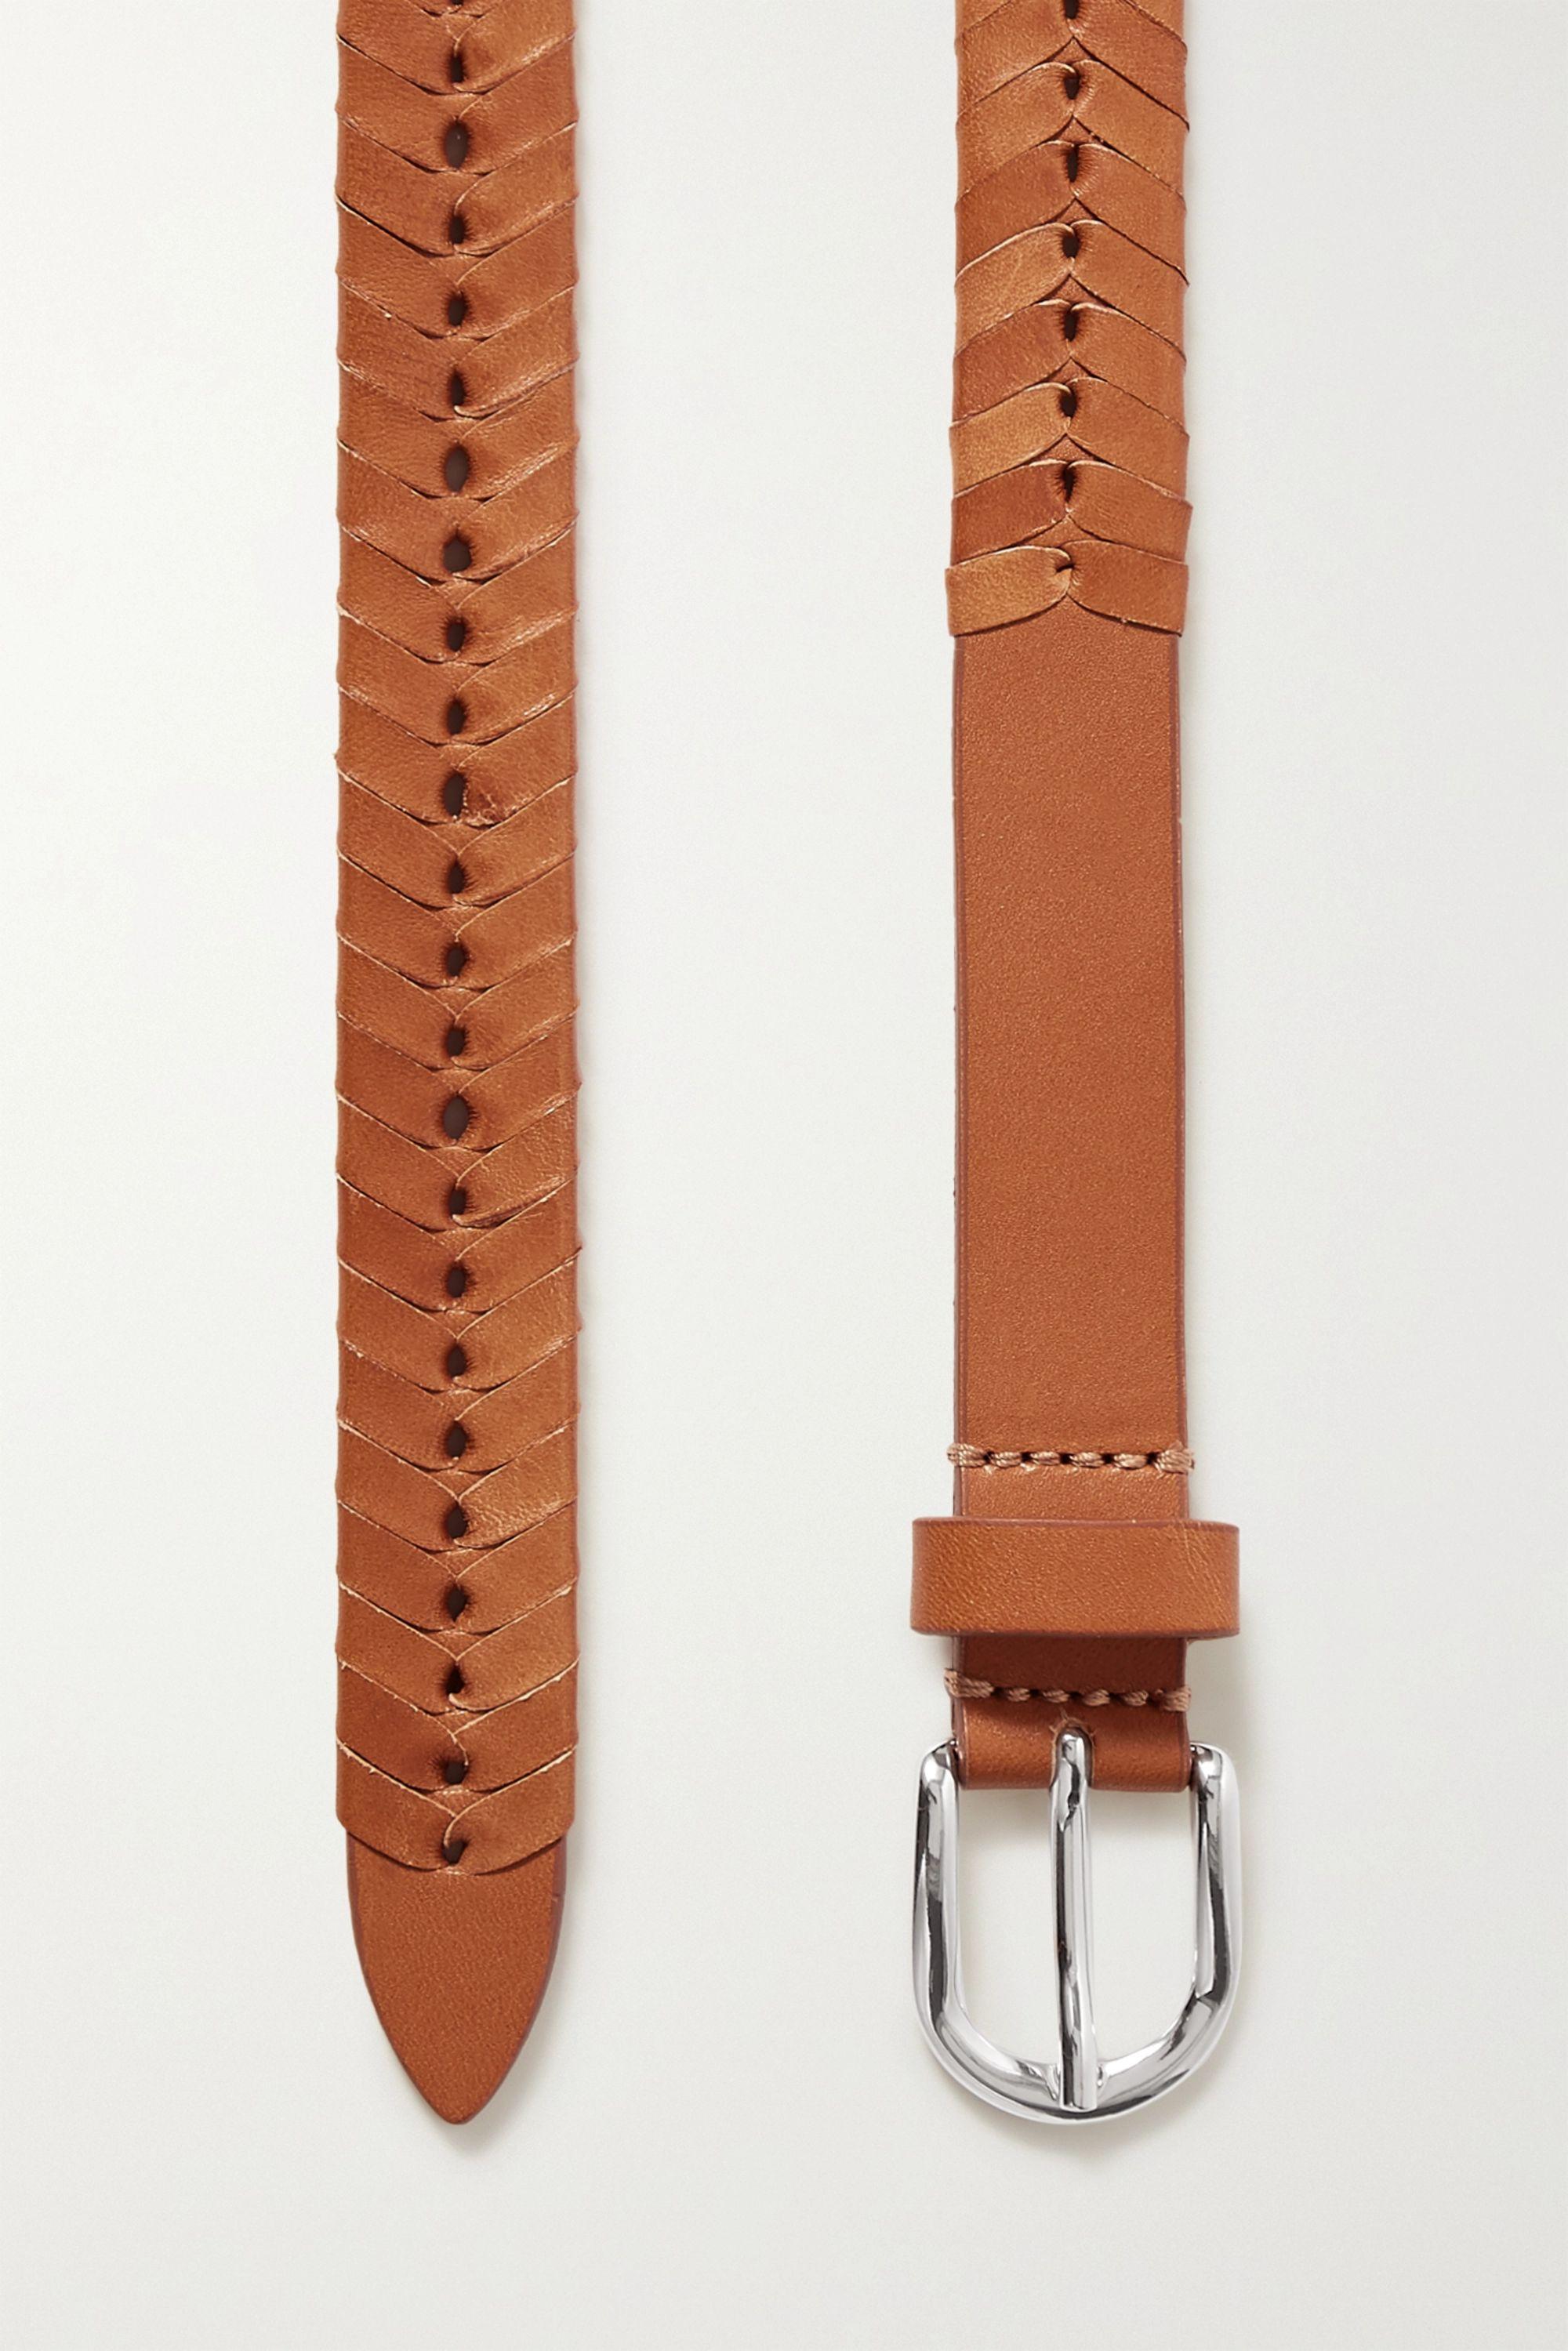 Isabel Marant Pagoo leather belt